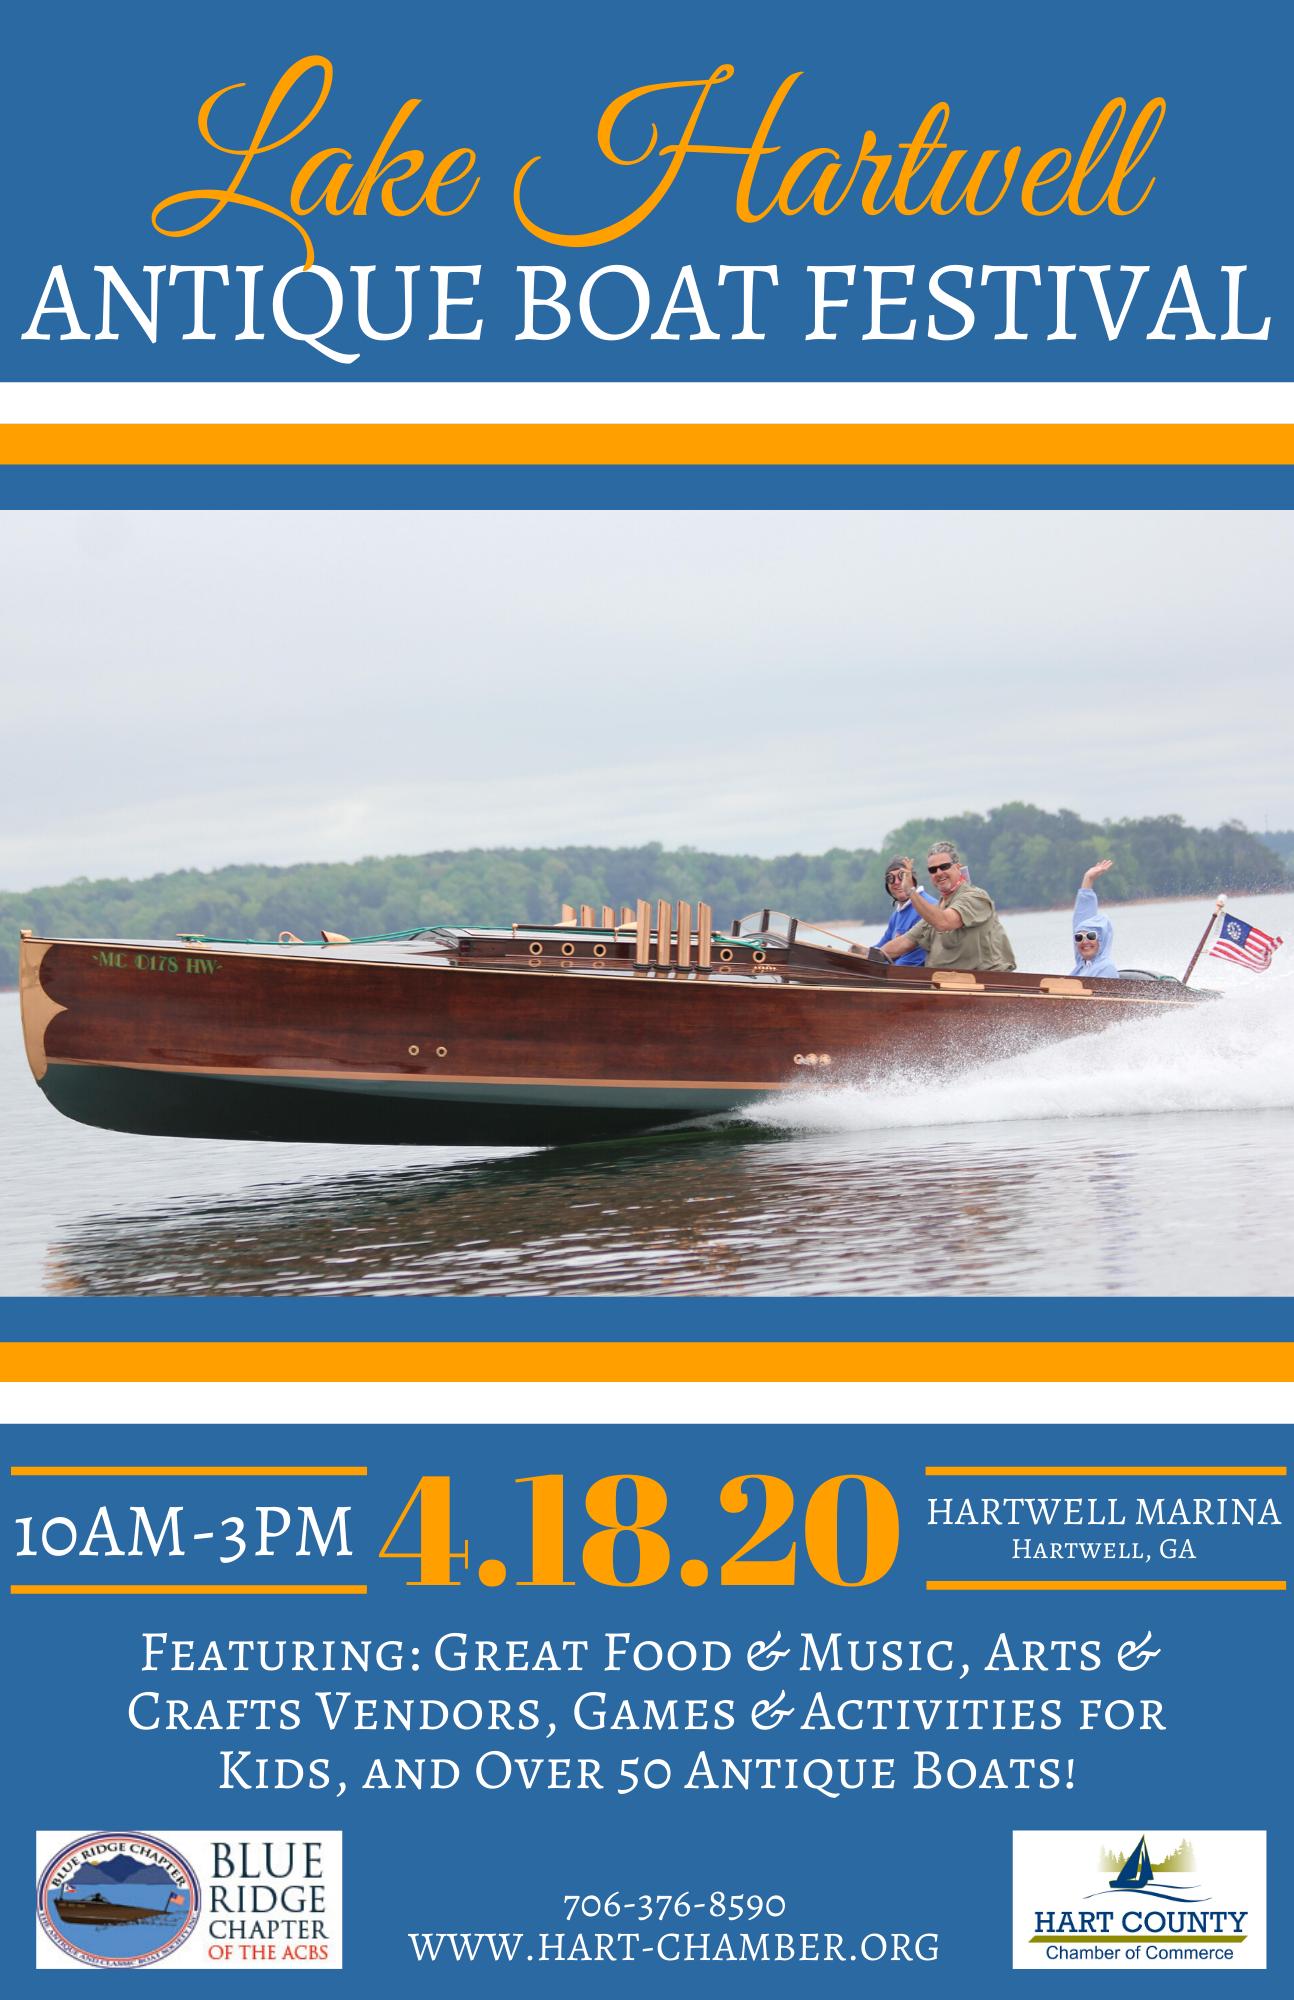 Antique-Boat-Festival-Poster.png